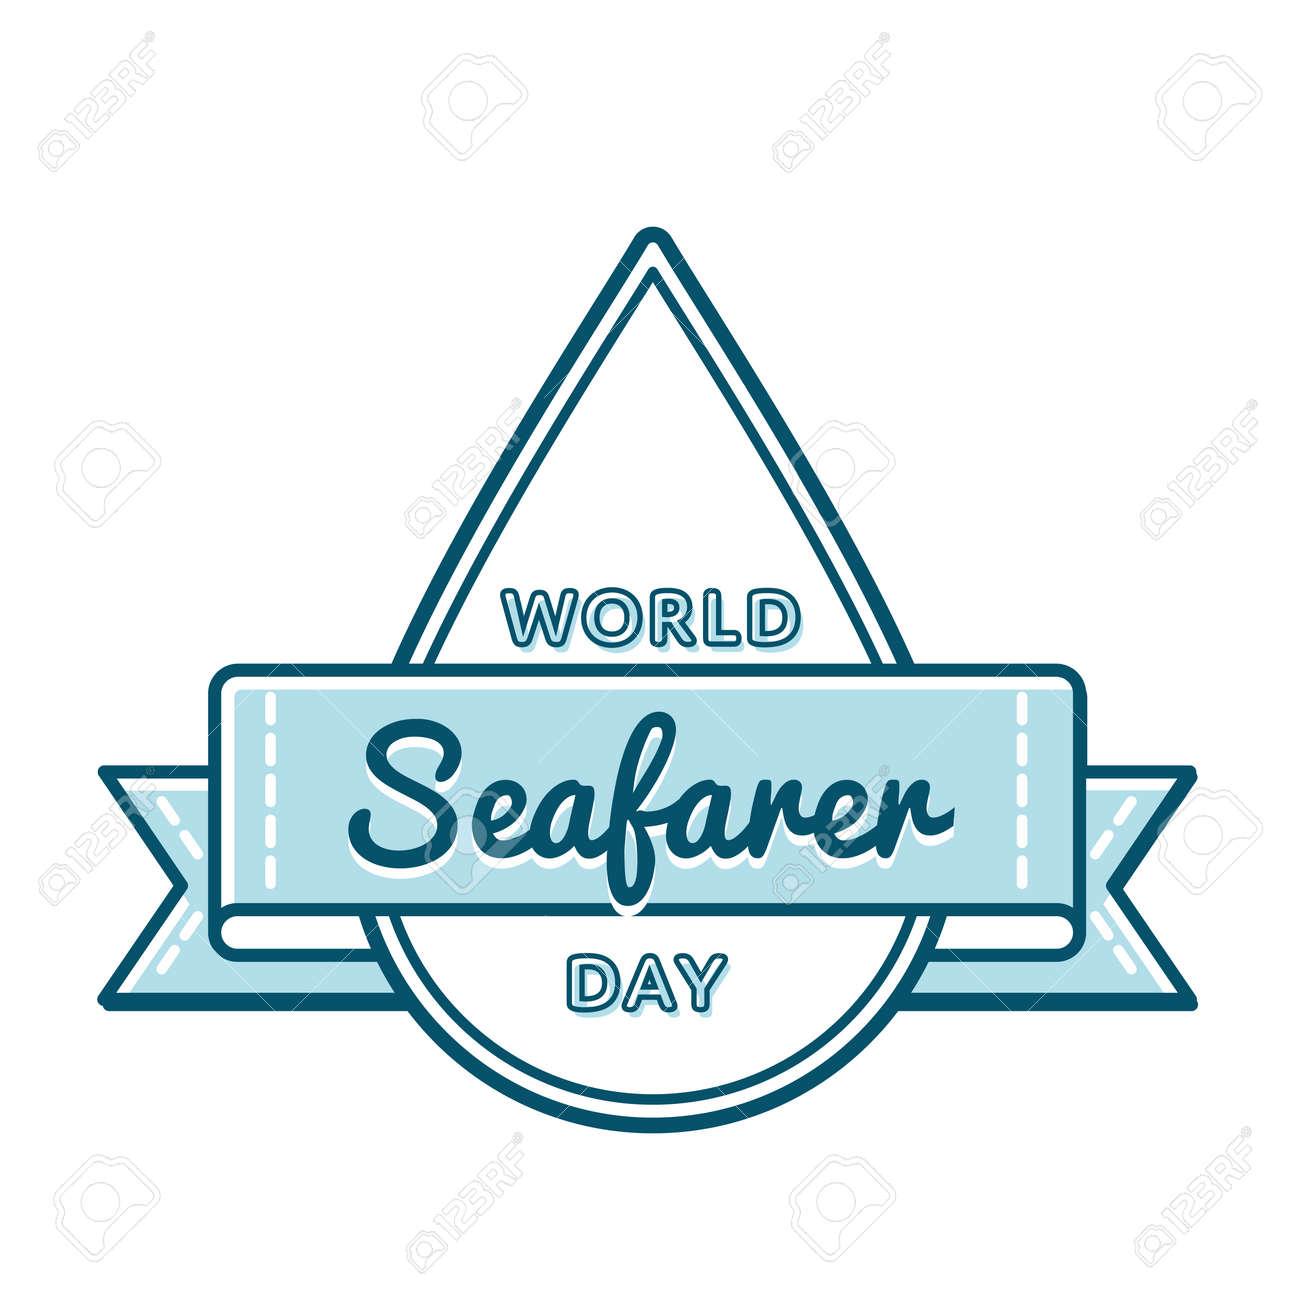 World Seafarer day greeting emblem - 78003410